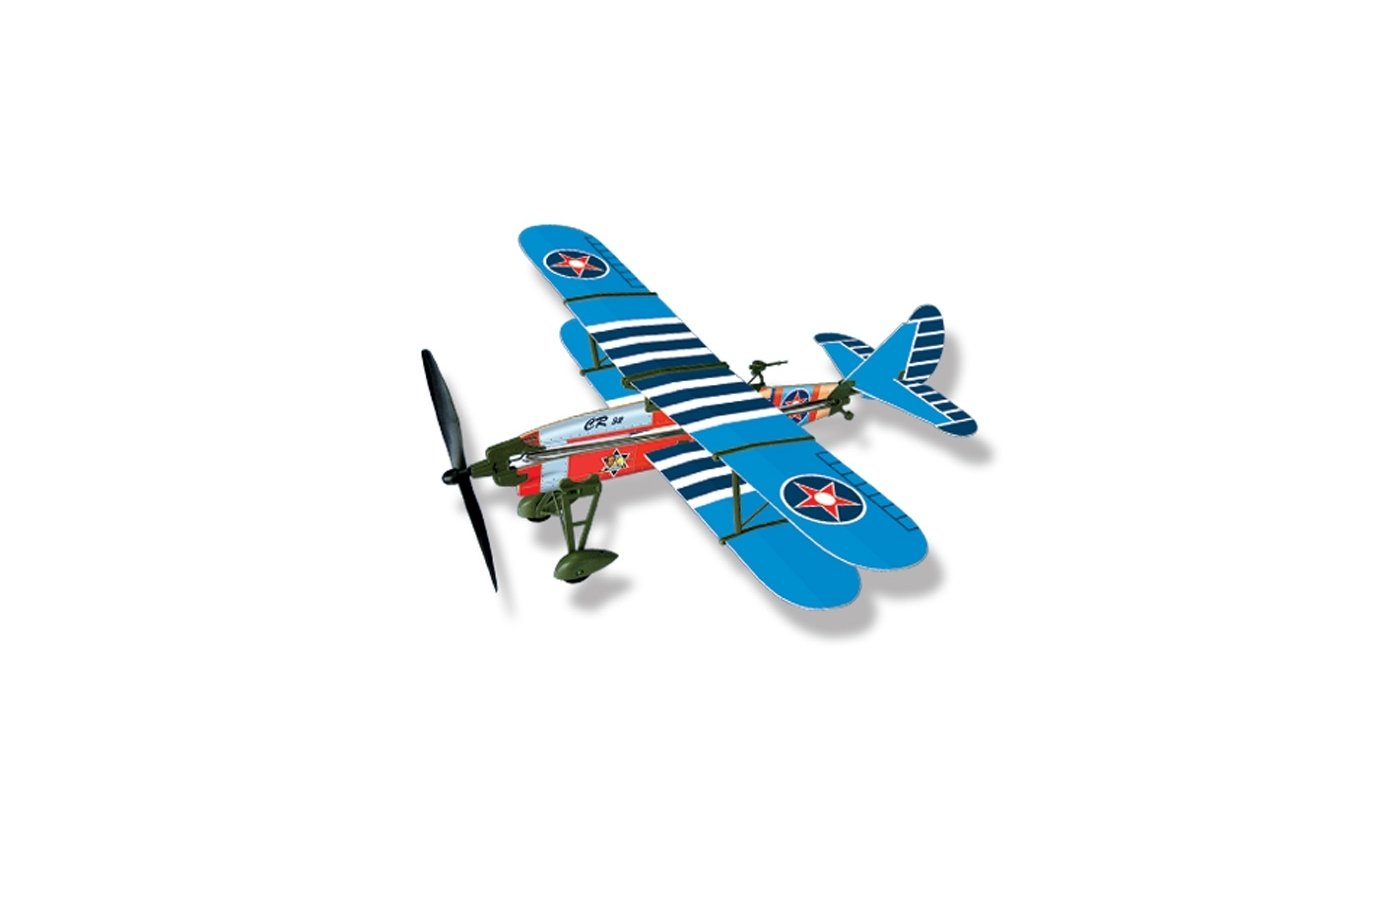 Машинка LYONAEEC 22004(E) Самолет с резиномотором History Plane CR.32 Airplane